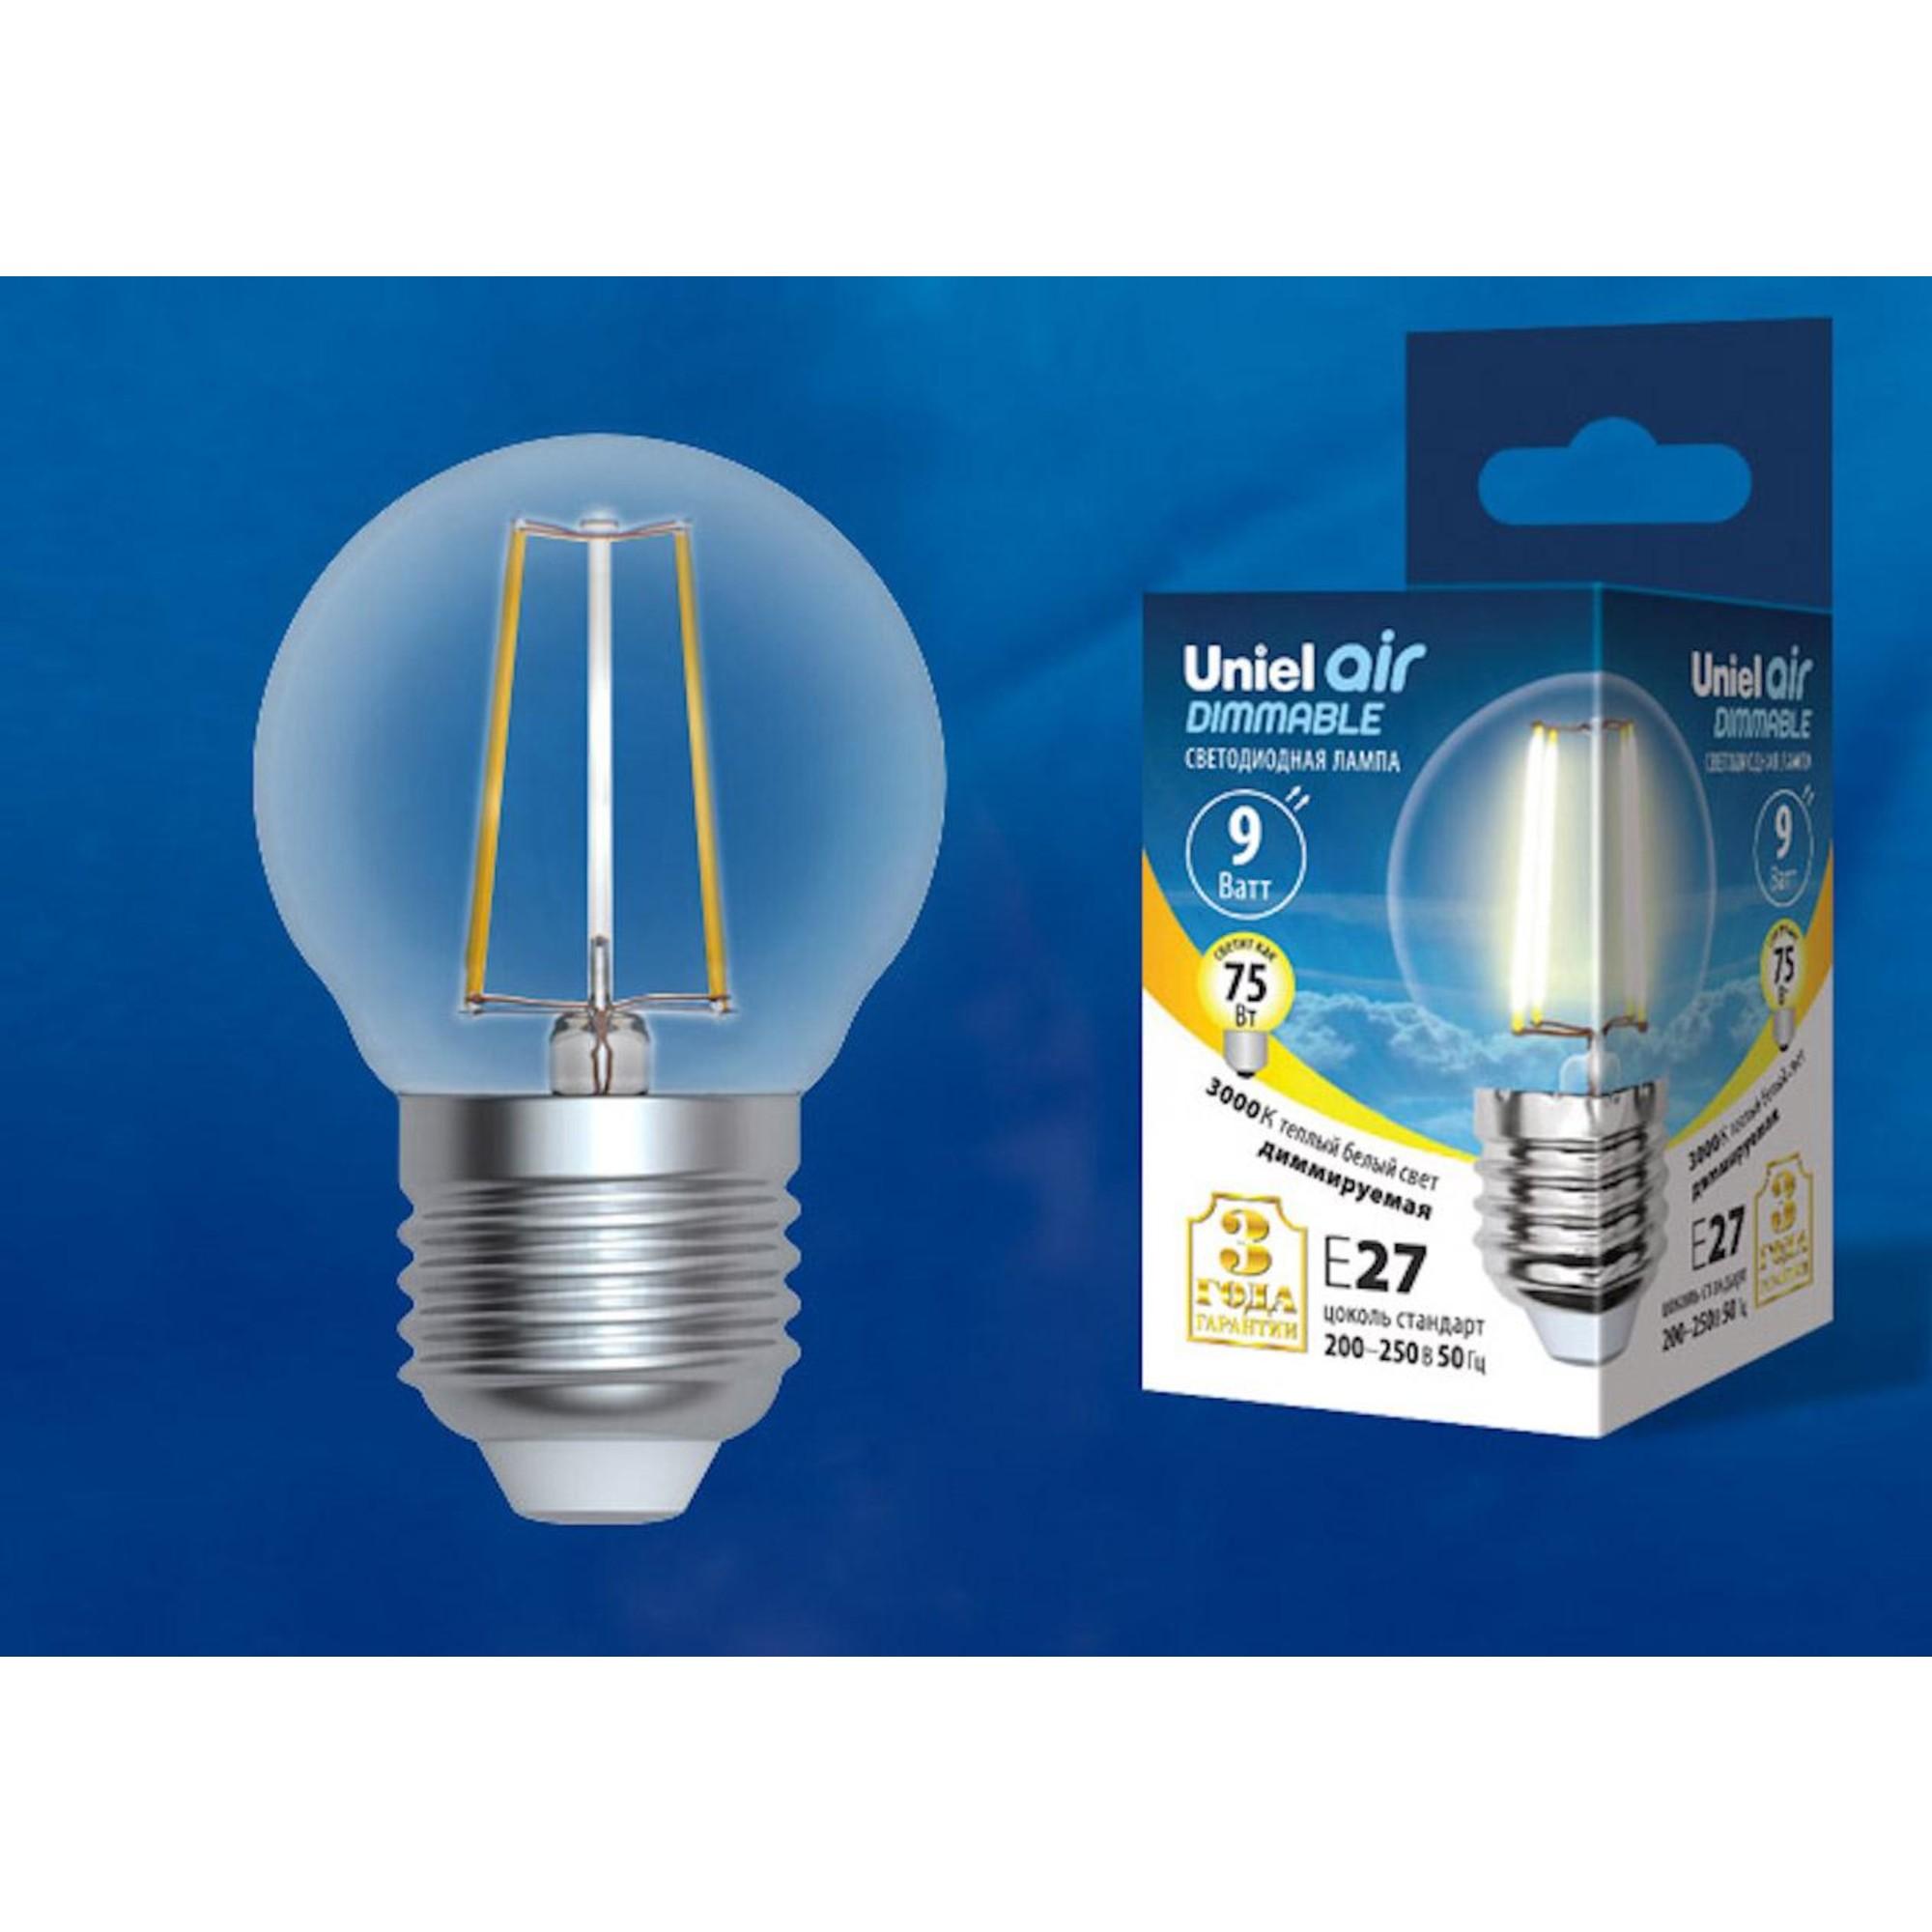 Светодиодная лампочка Uniel LED-G45-9W AIR DIMMABLE UL-00005193